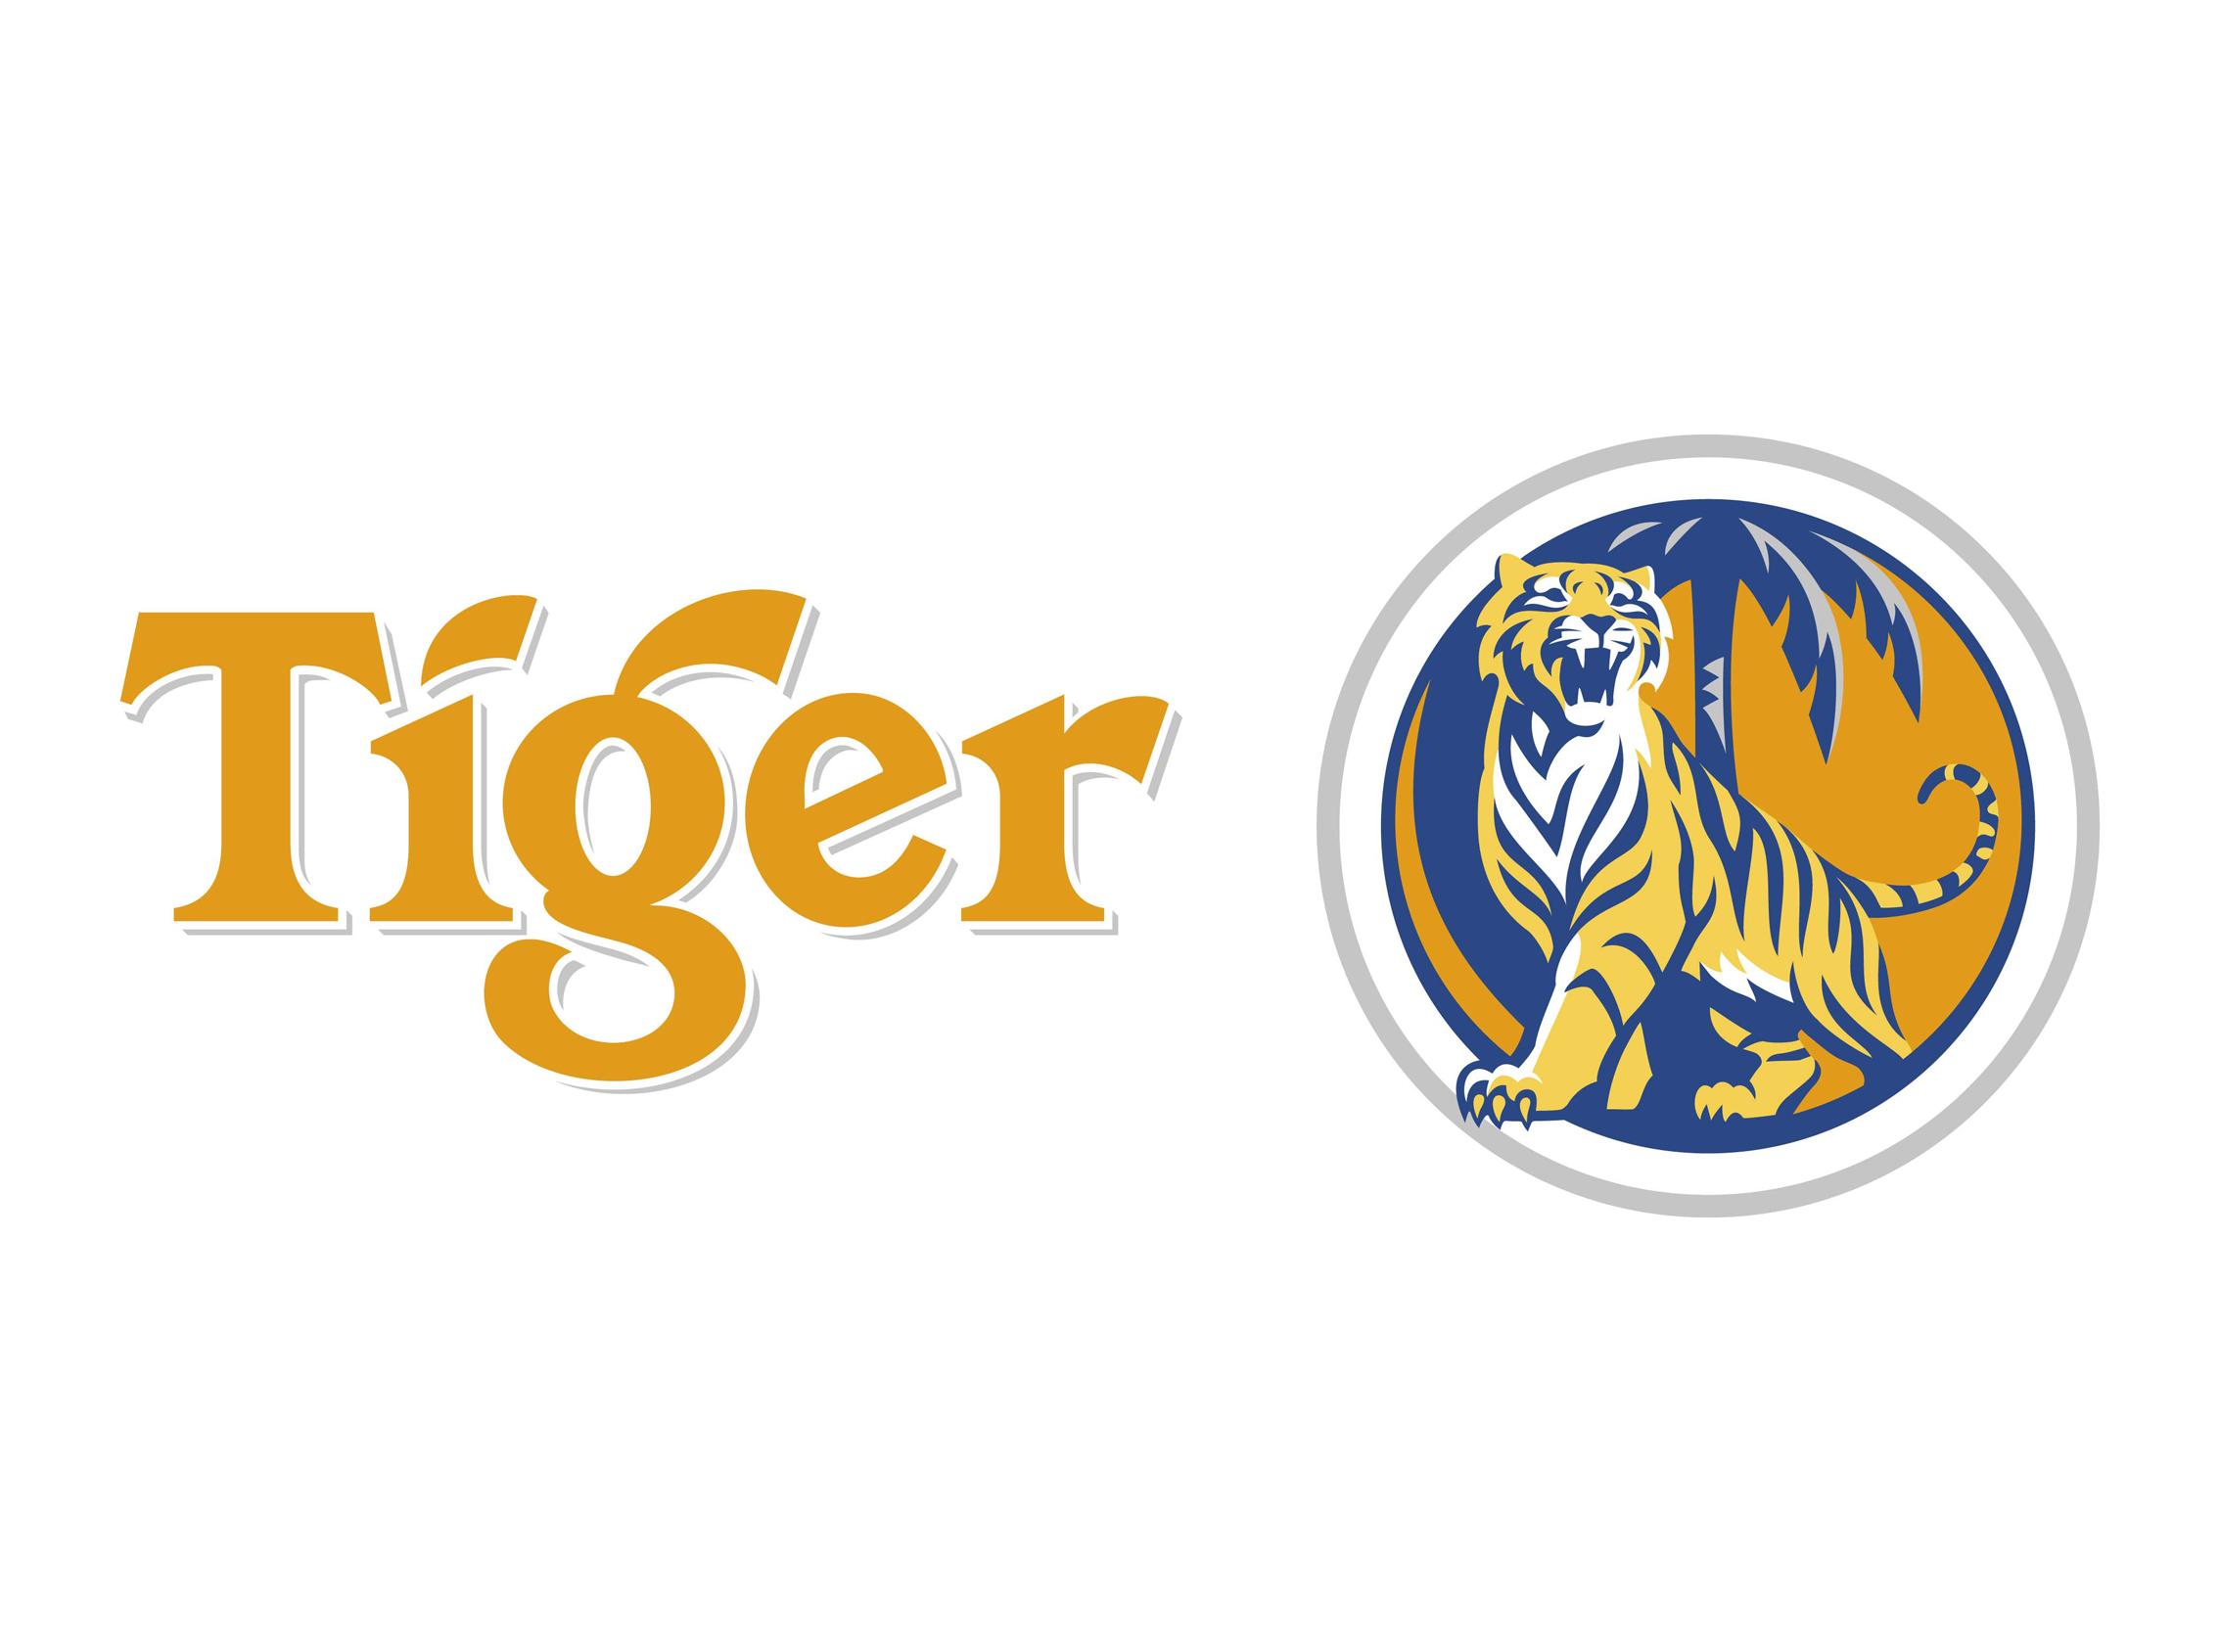 Tiger beer logo.